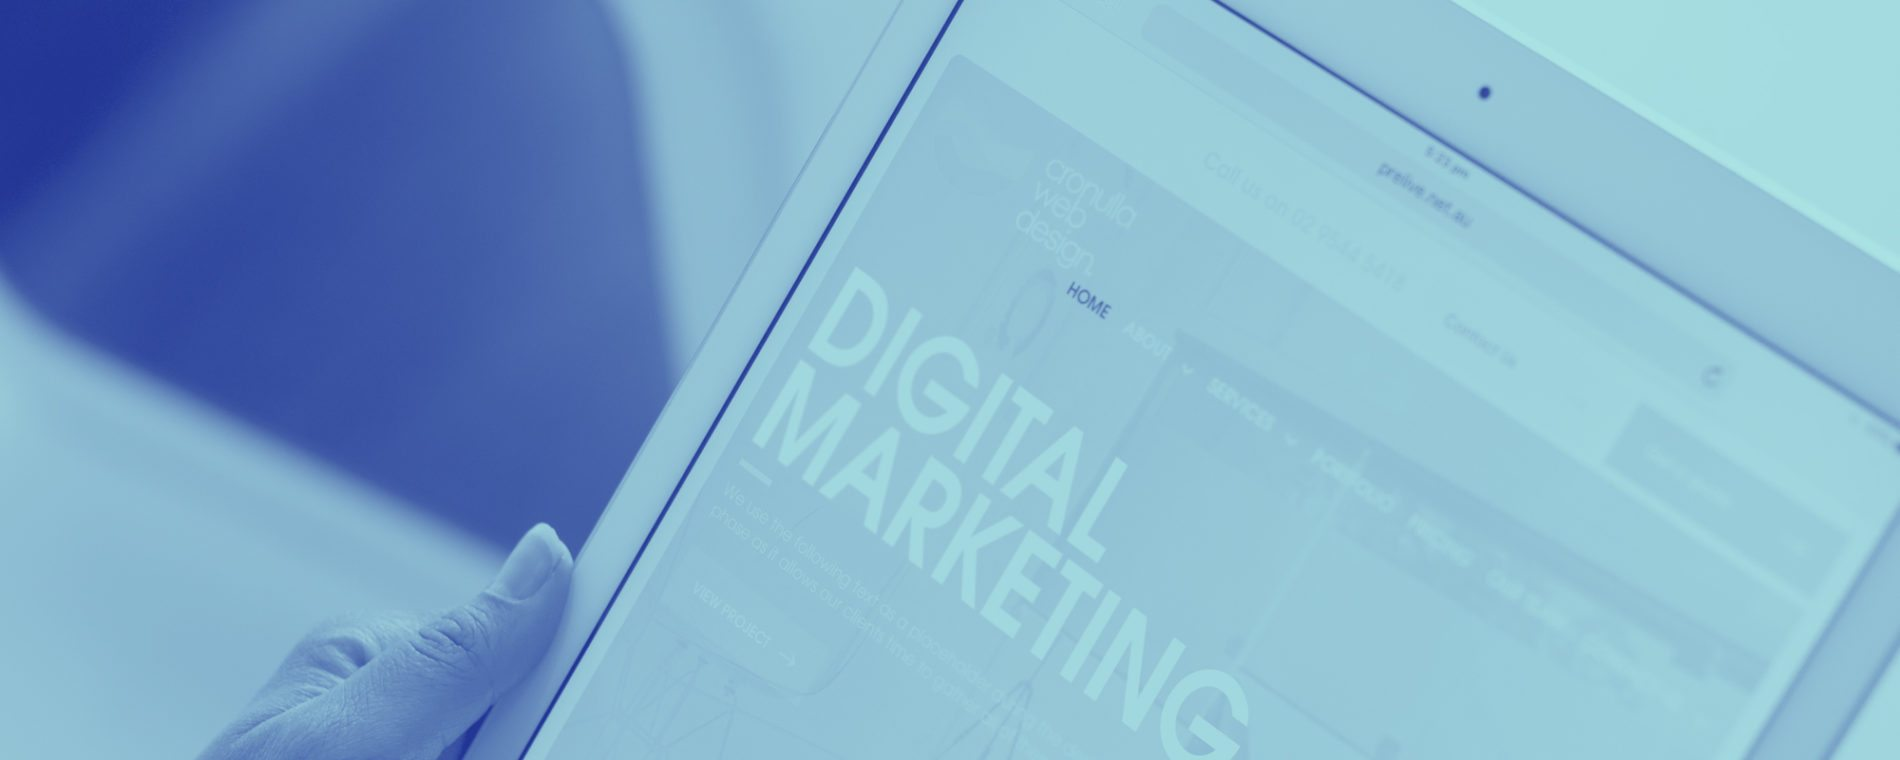 Digital Marketing - Cronulla Web Design - Website Design Sutherland Shire